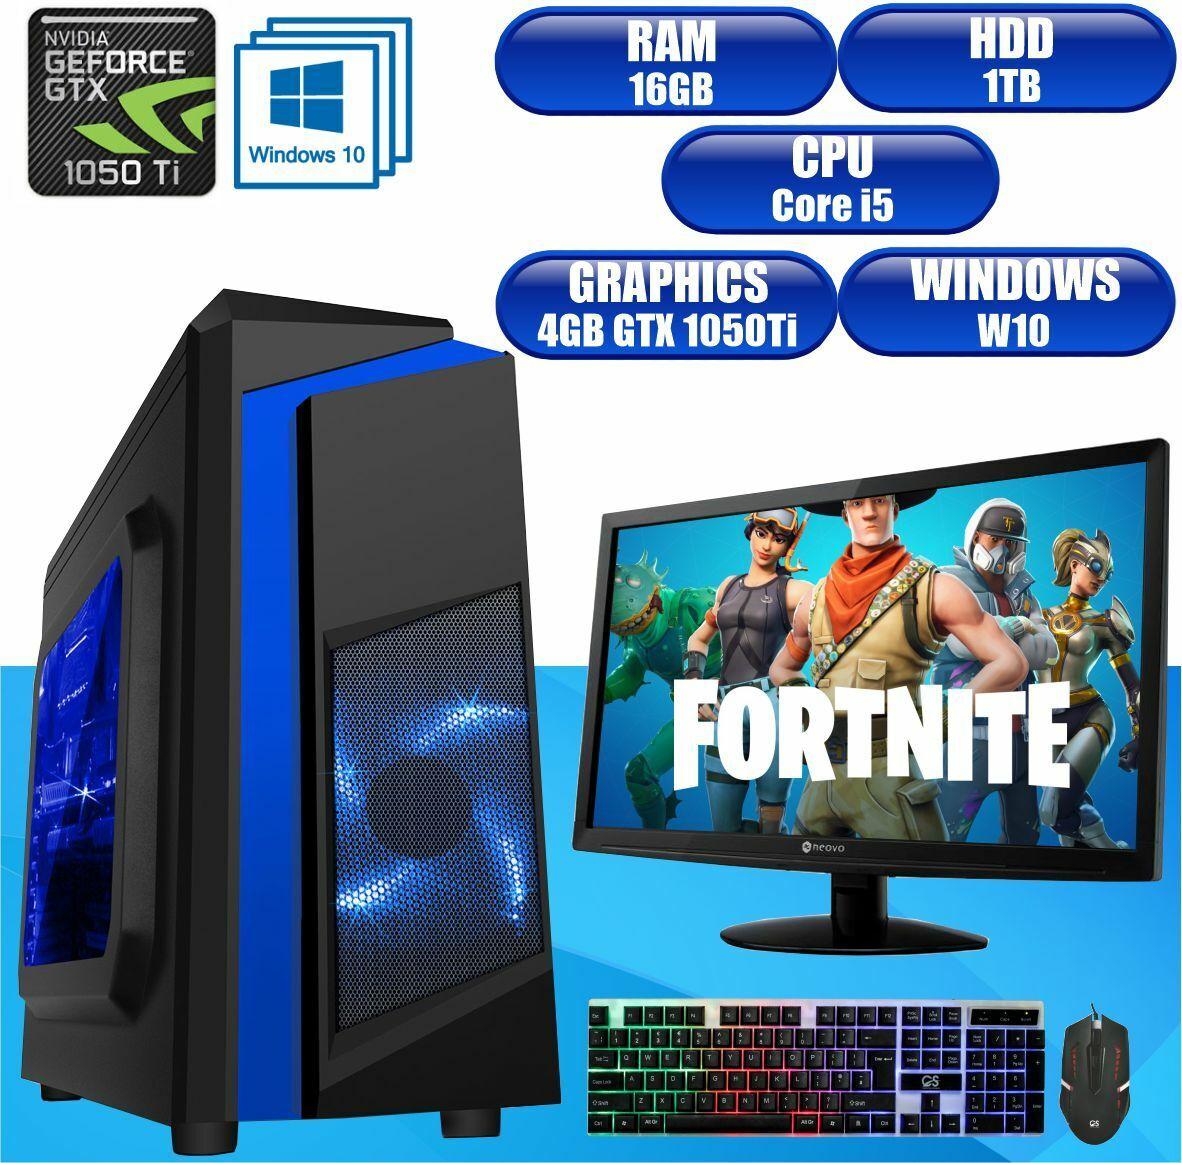 Computer Games - Fast Gaming PC Computer Bundle Intel Core i5 16GB 1TB Windows 10 4 GB GTX1050Ti